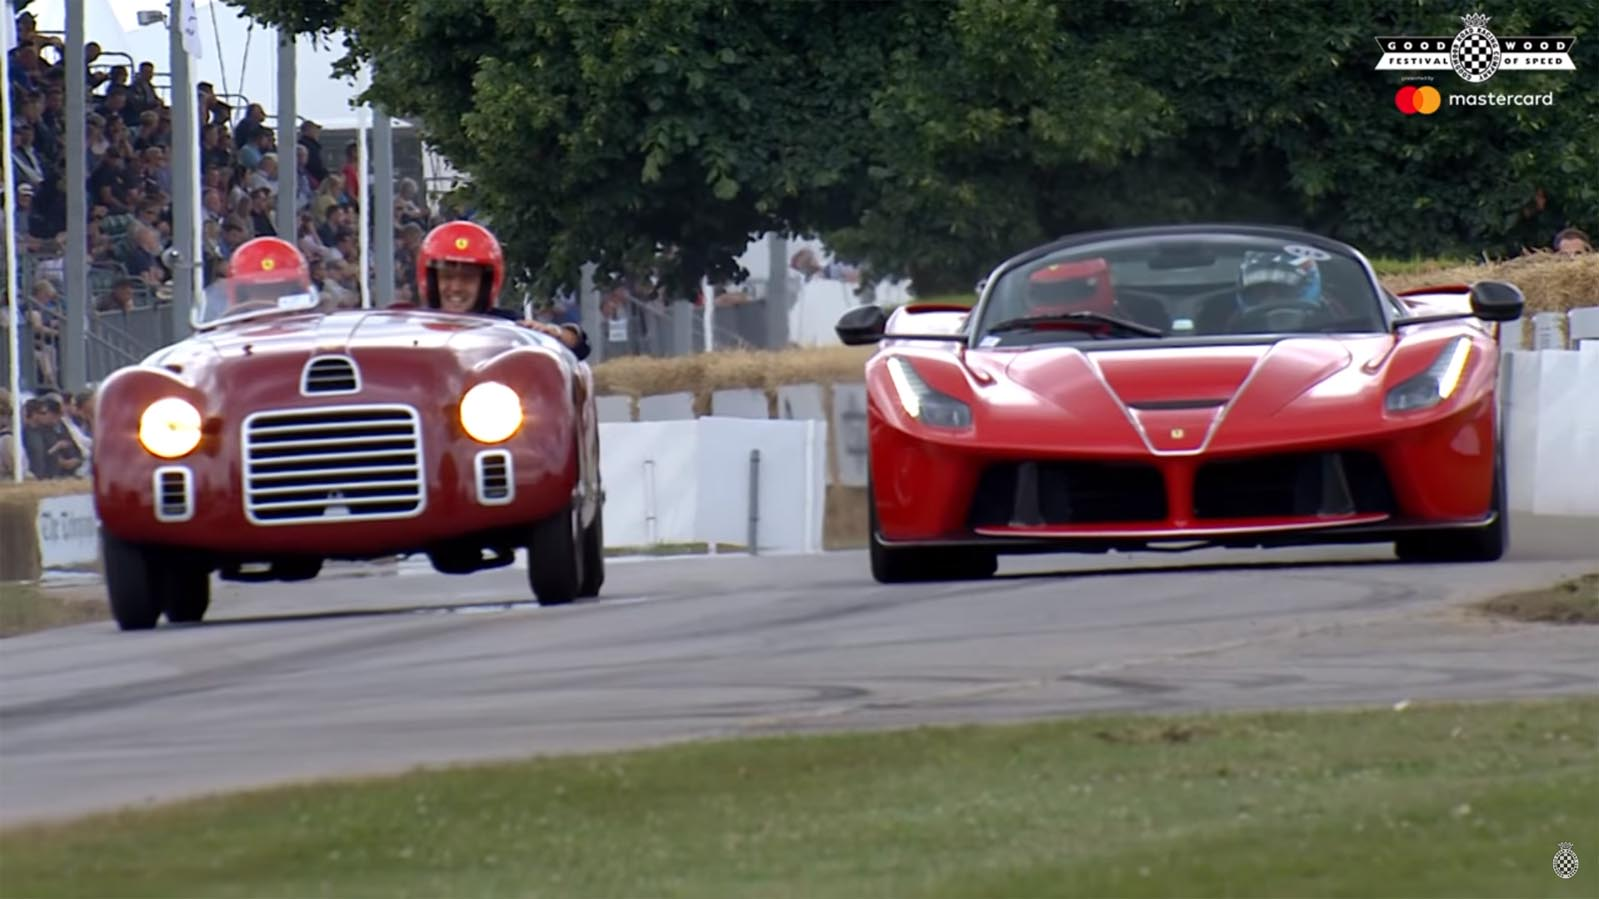 Photo of Τα highlights του Goodwood Festival of Speed μέσα από 16 βίντεο [vid]